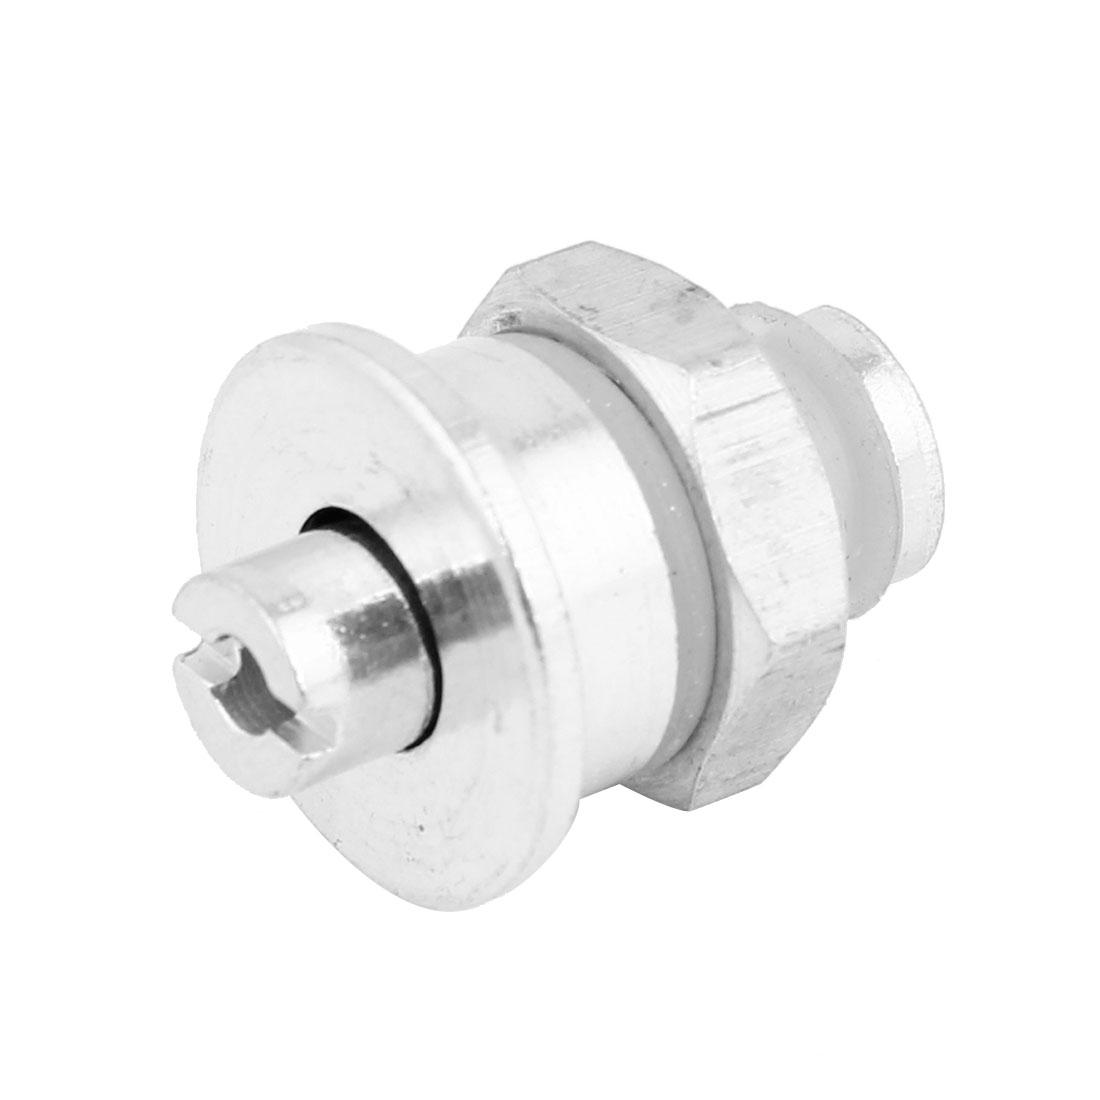 "1"" Length Metallic Replaceable Pressure Cooker Aluminium Safety Valve"